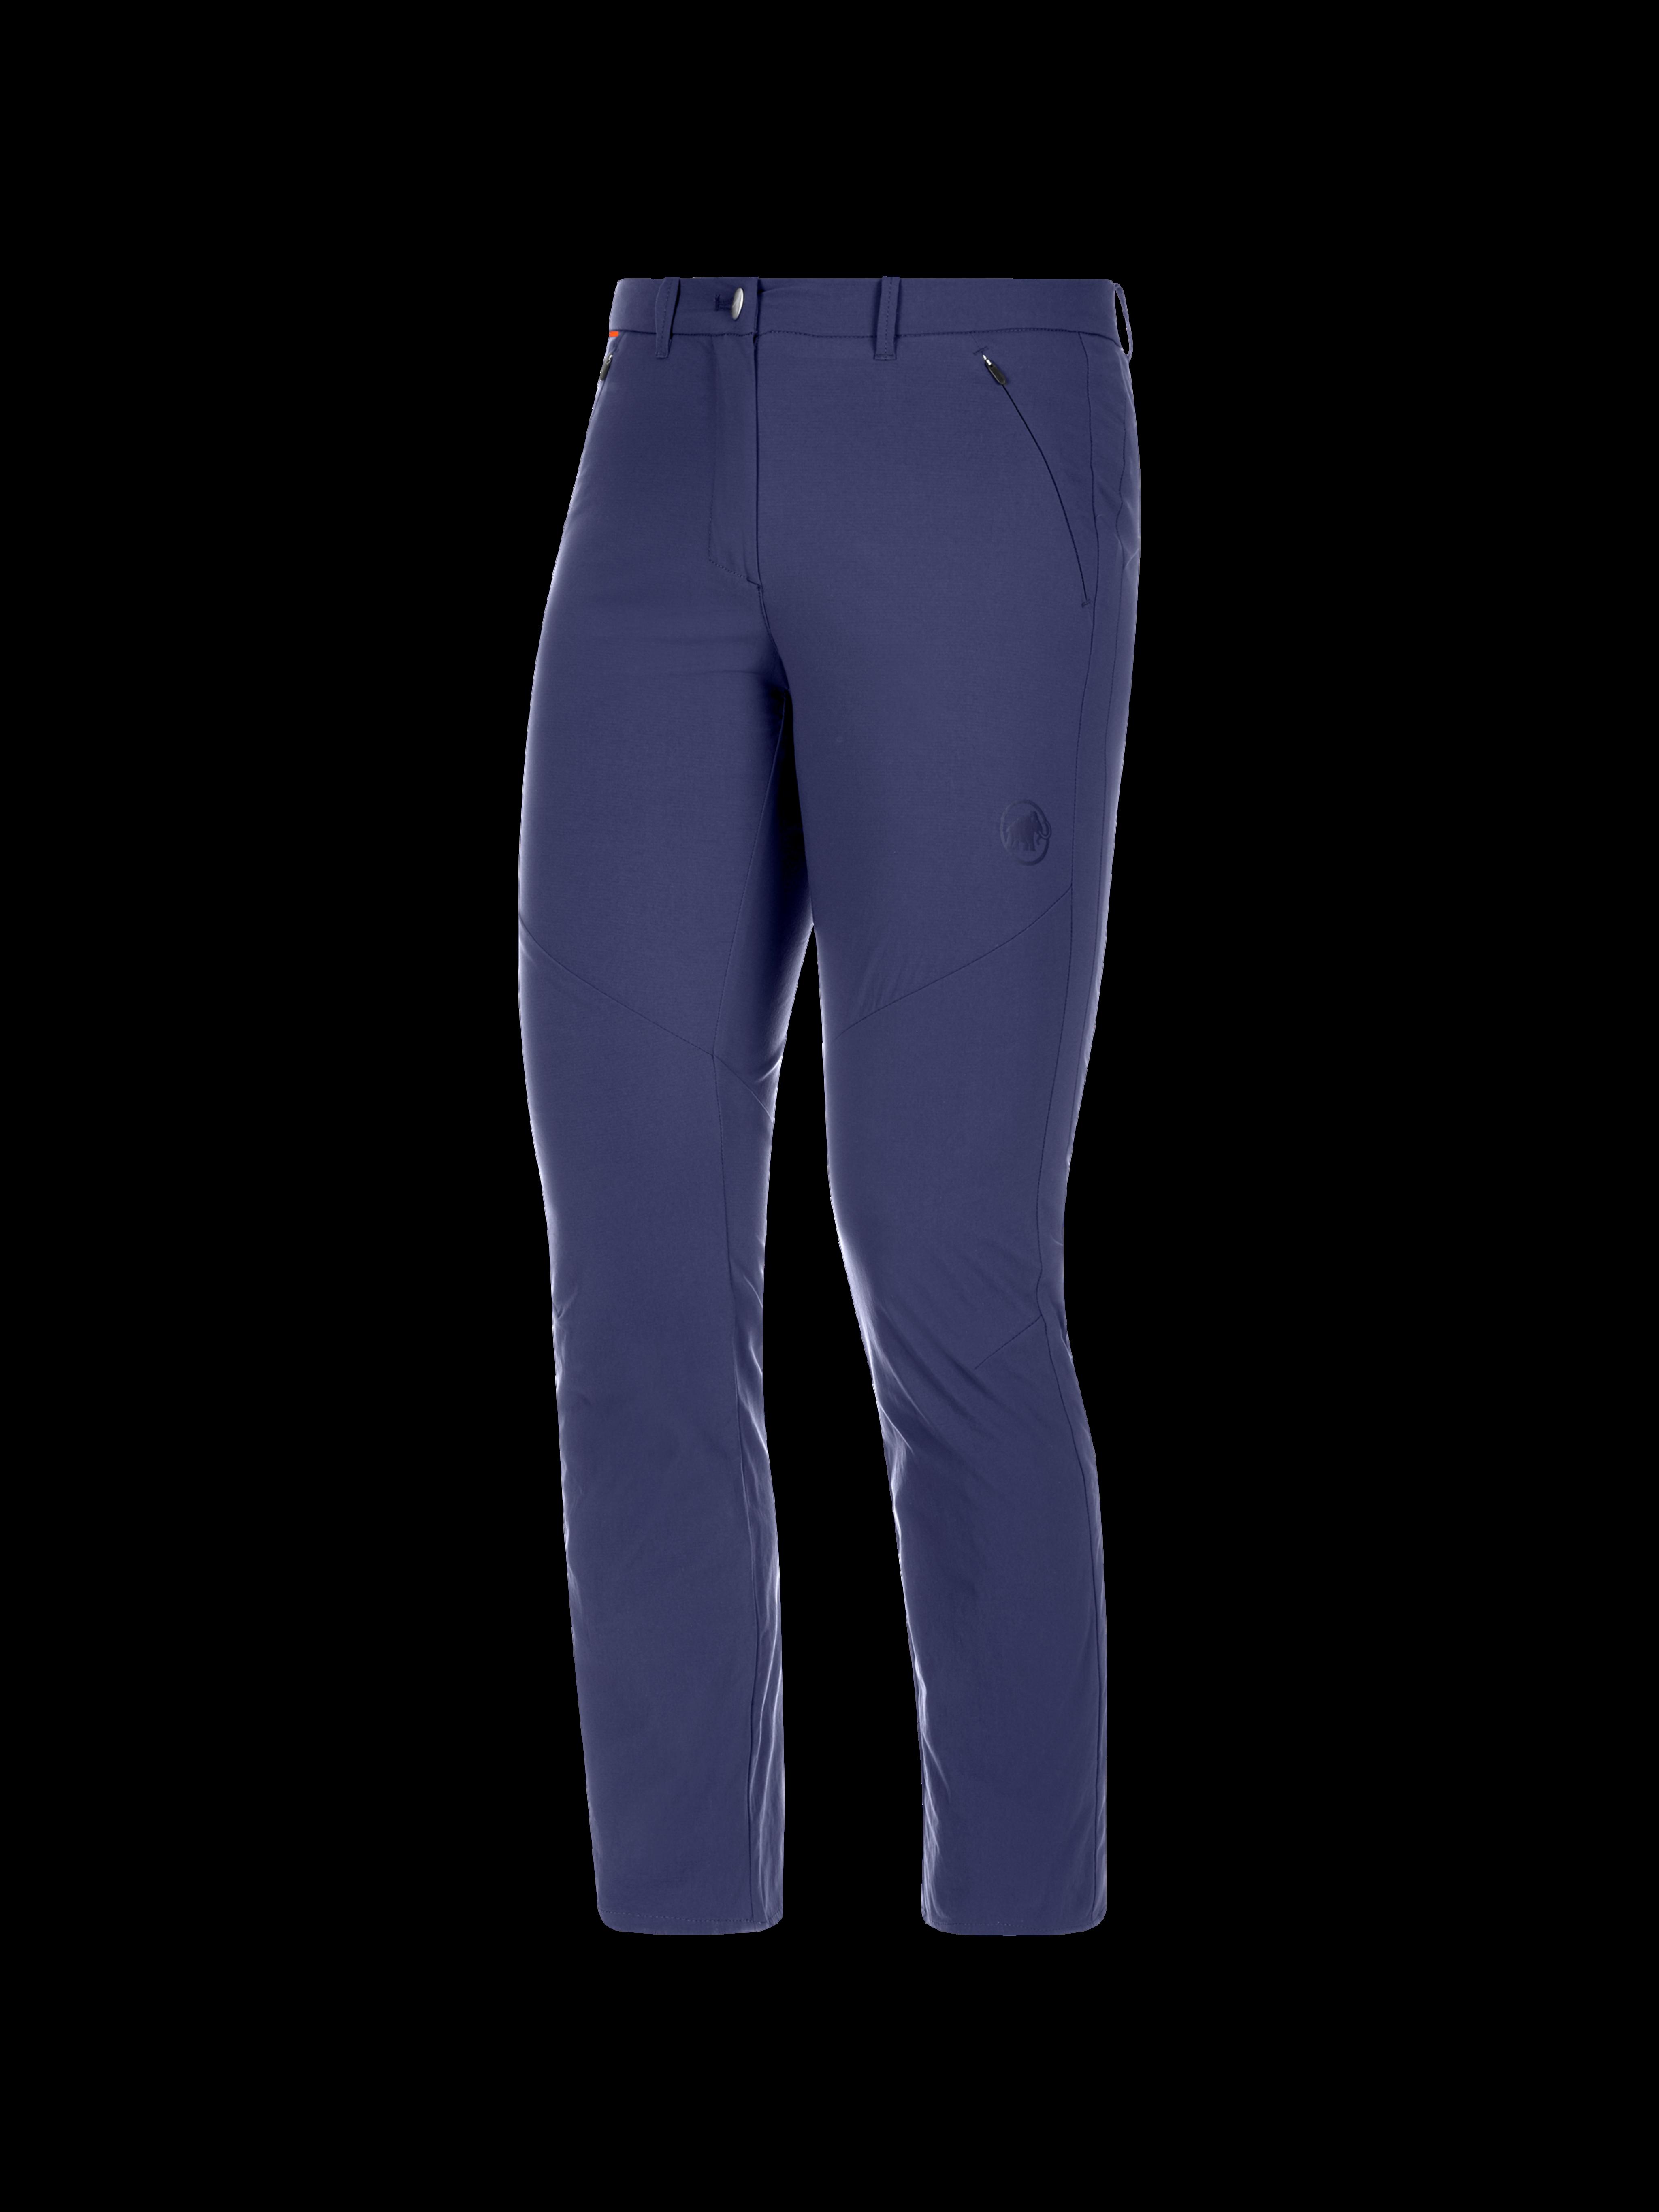 Hiking Pants RG Women product image